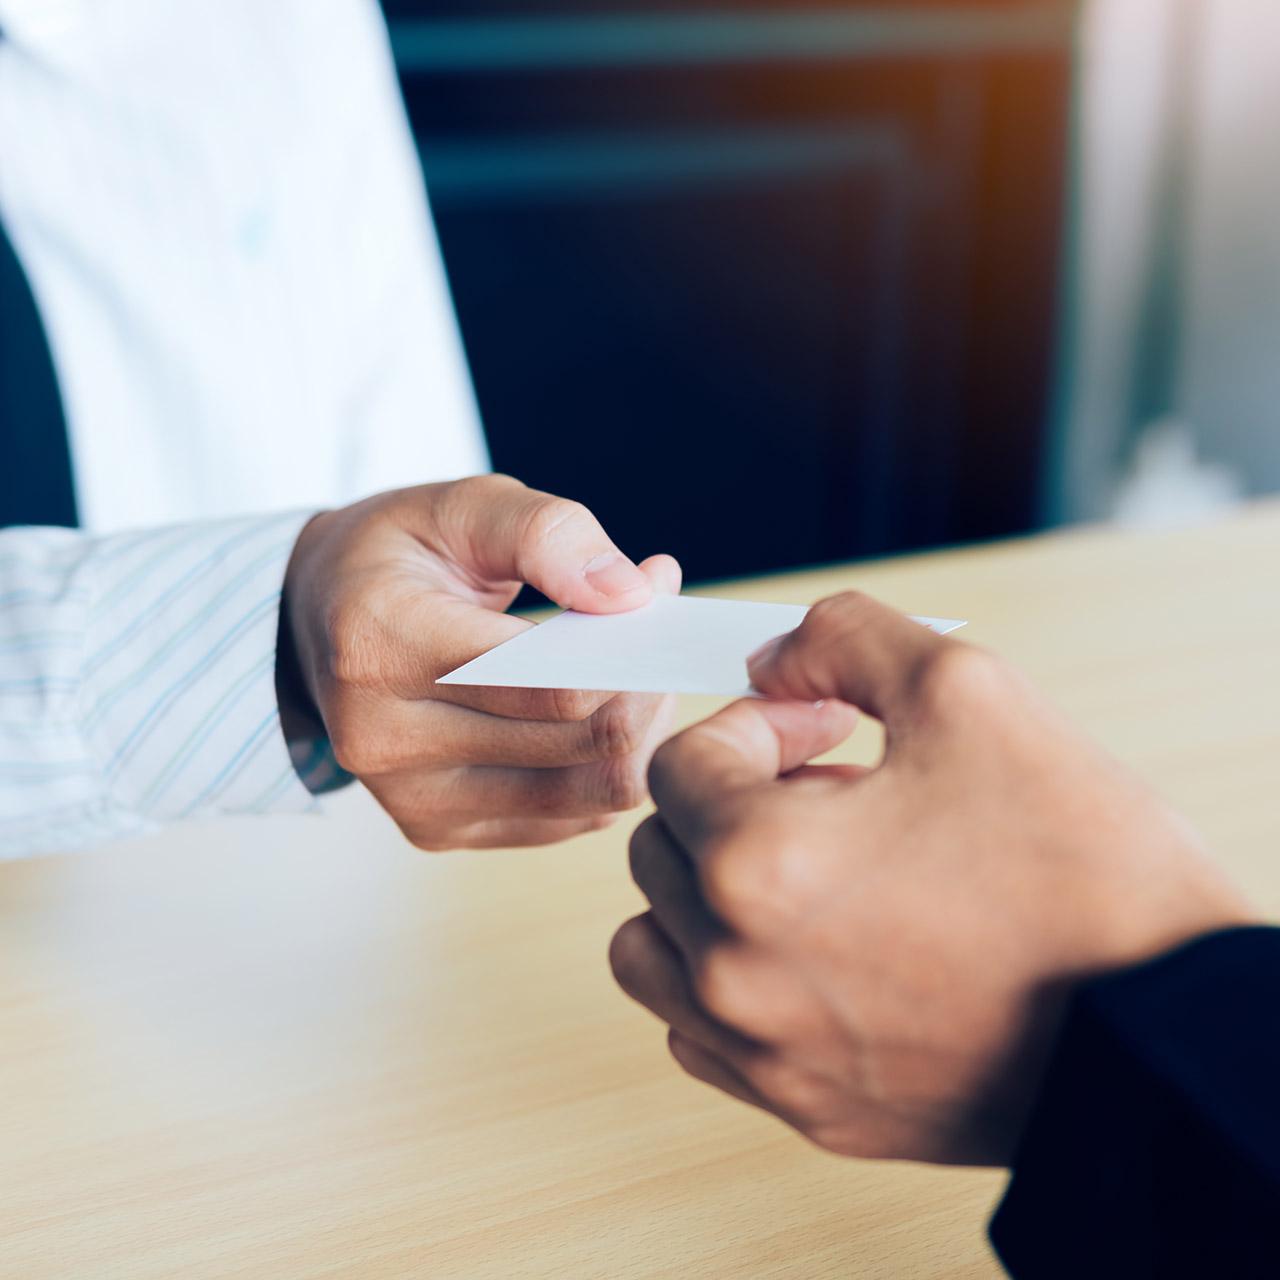 D365 business card scanning